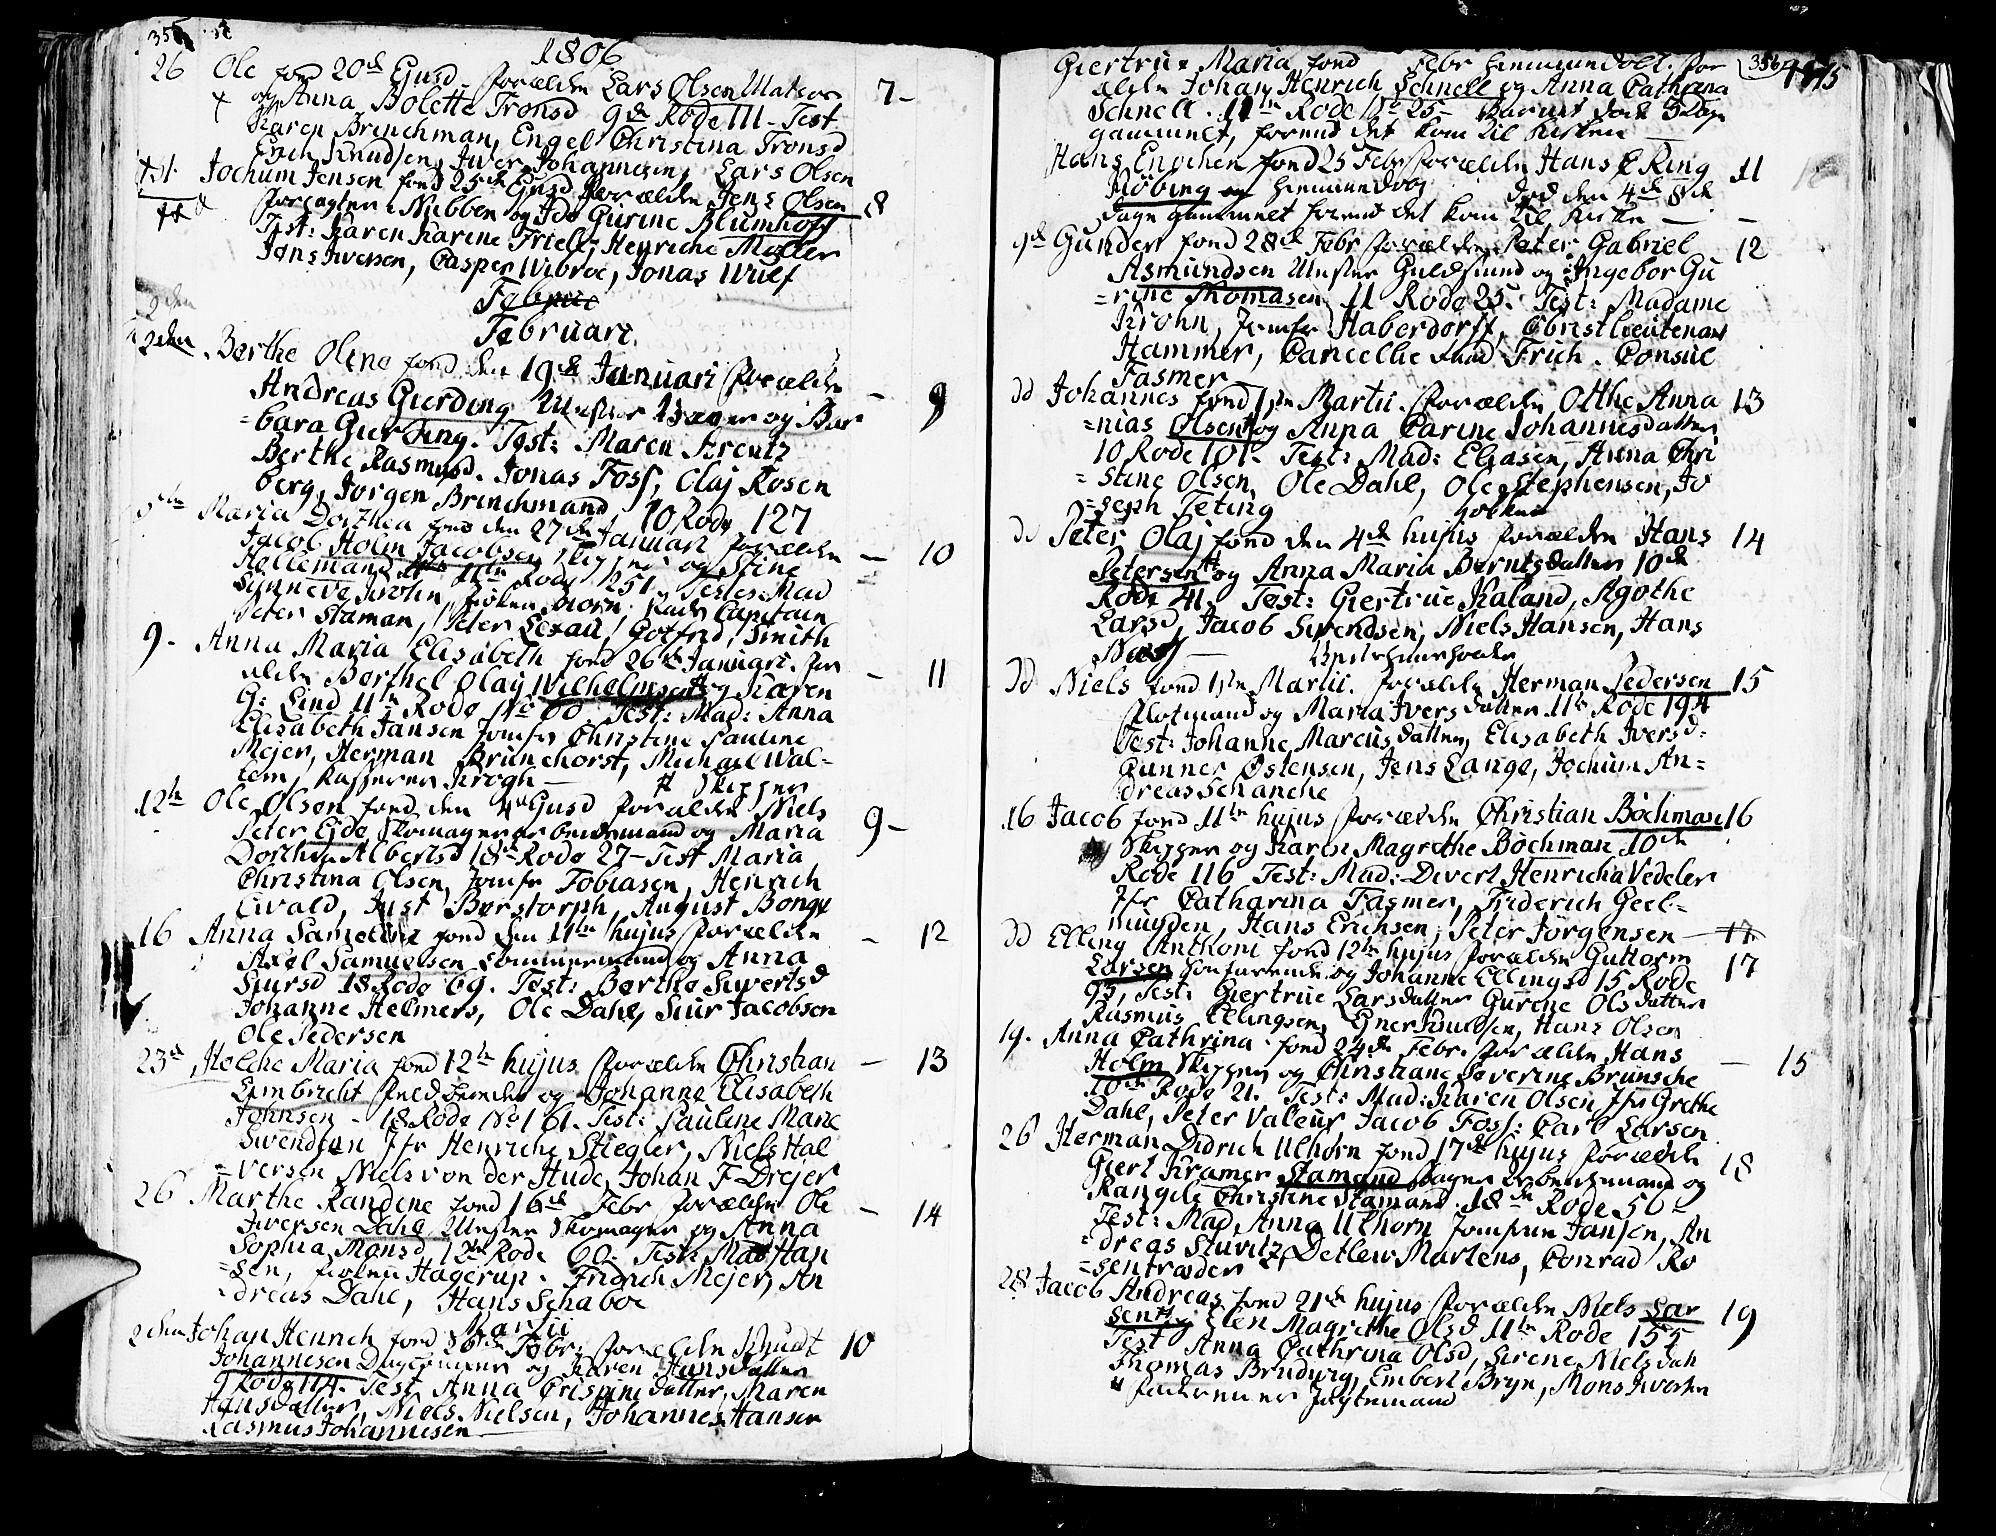 SAB, Domkirken sokneprestembete, H/Haa/L0004: Ministerialbok nr. A 4, 1763-1820, s. 355-356